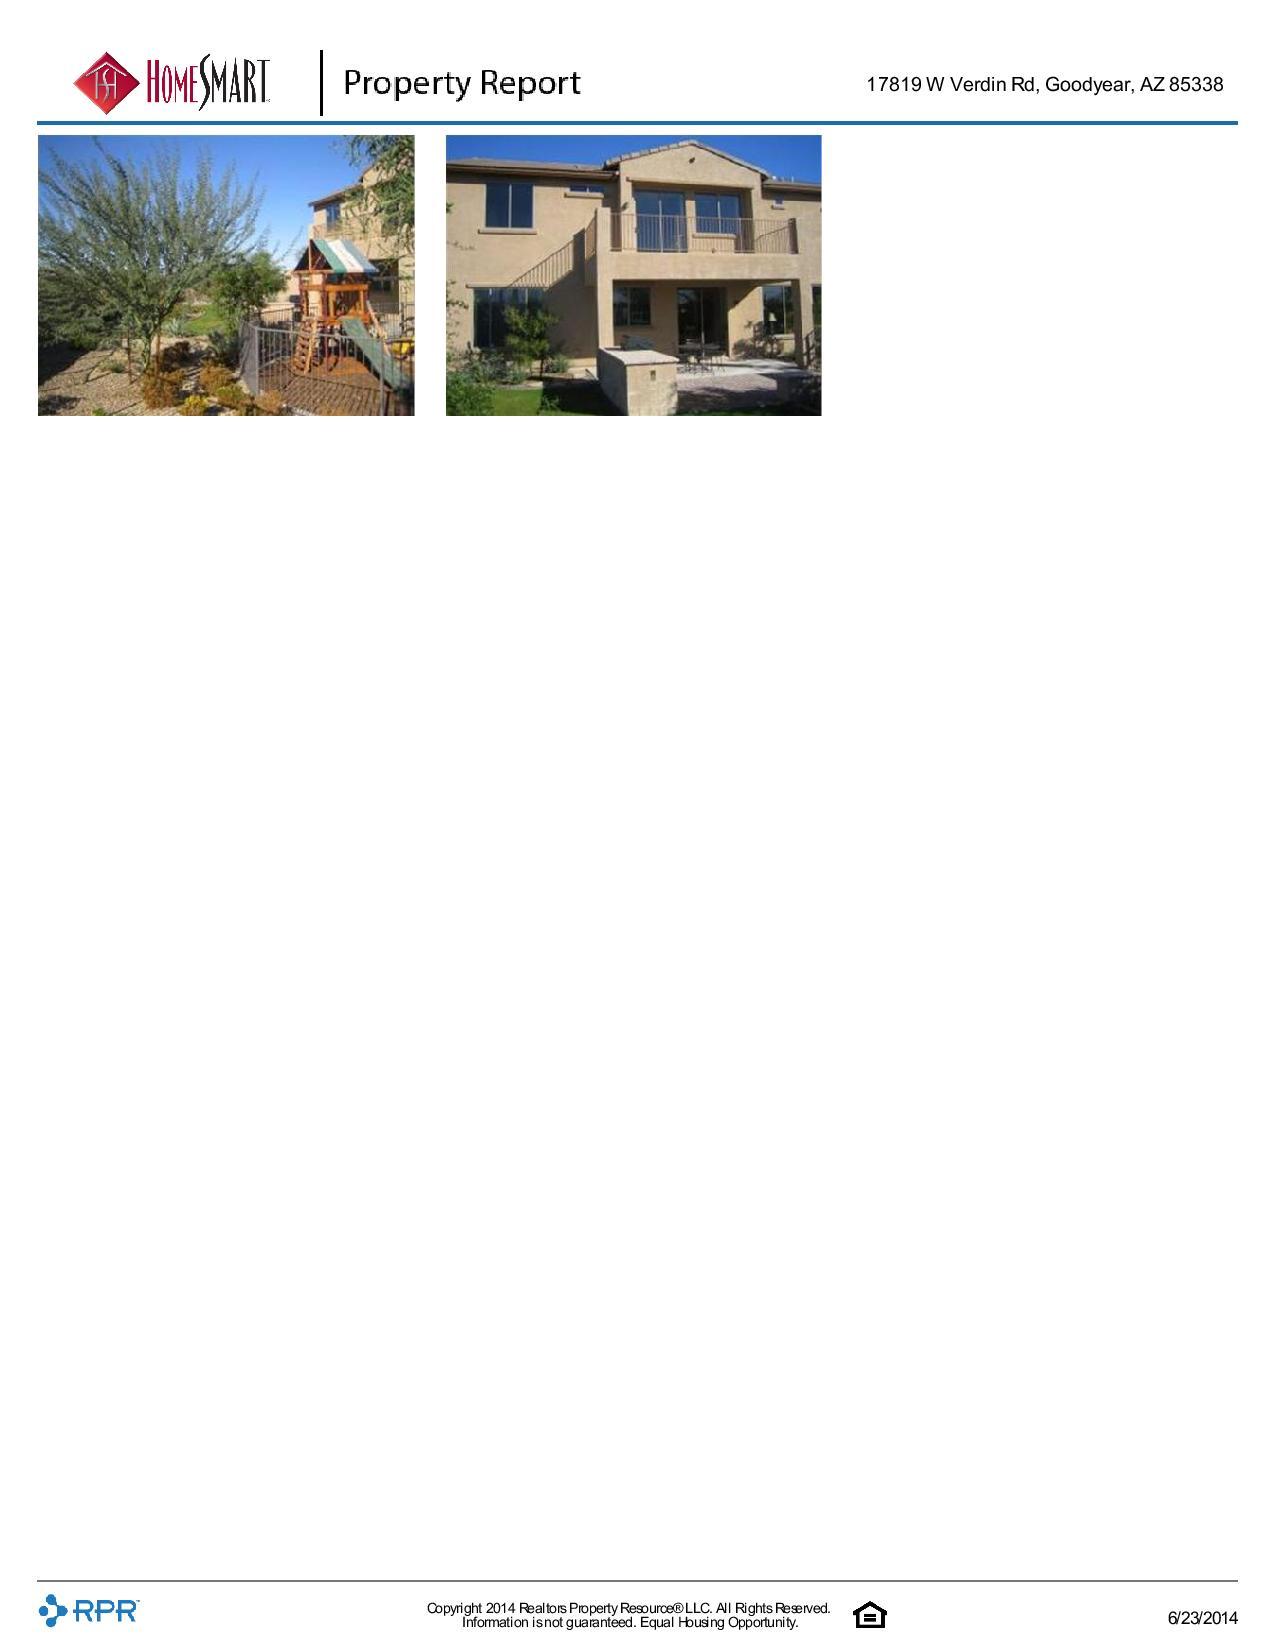 17819-W-Verdin-Rd-Goodyear-AZ-85338-page-008